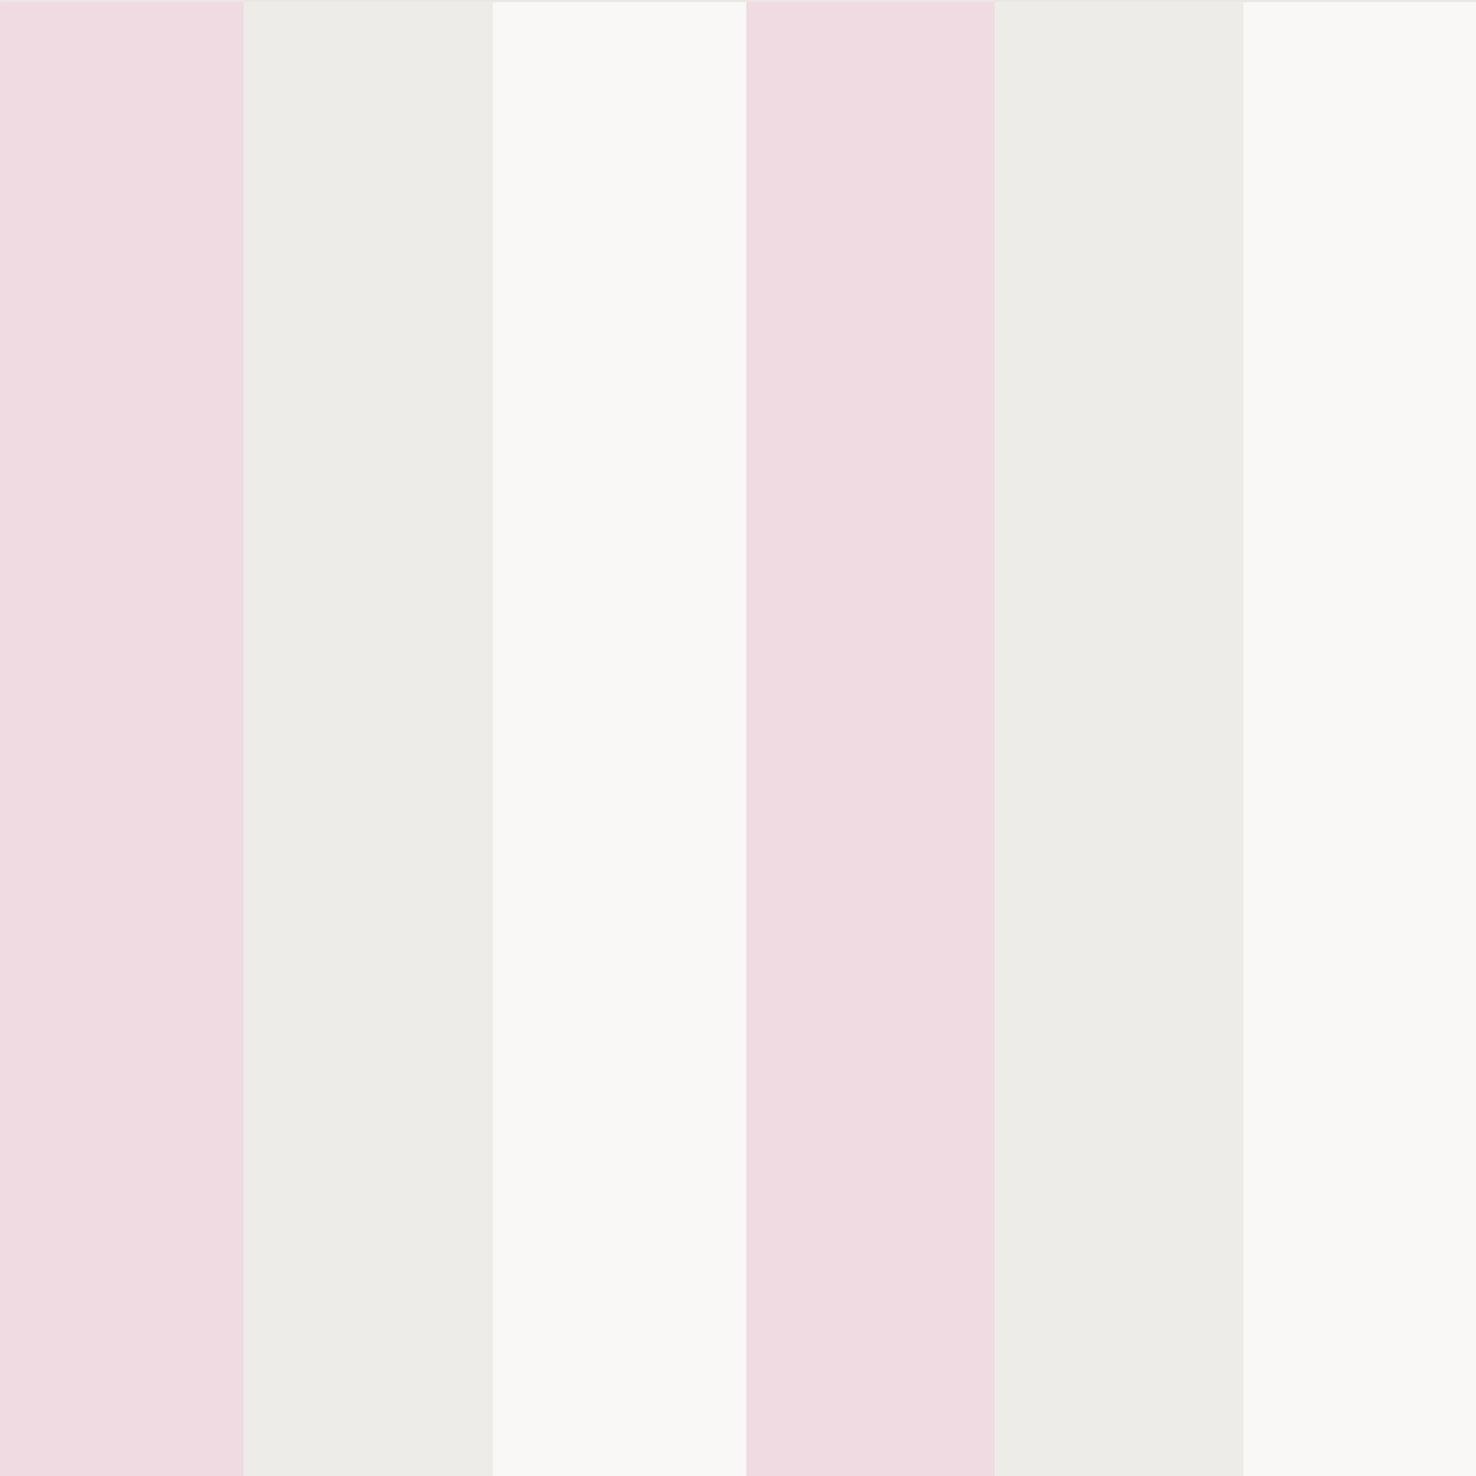 Papiertapete streifen rasch textil rosa grau 330280 - Rosa weiay gestreifte tapete ...